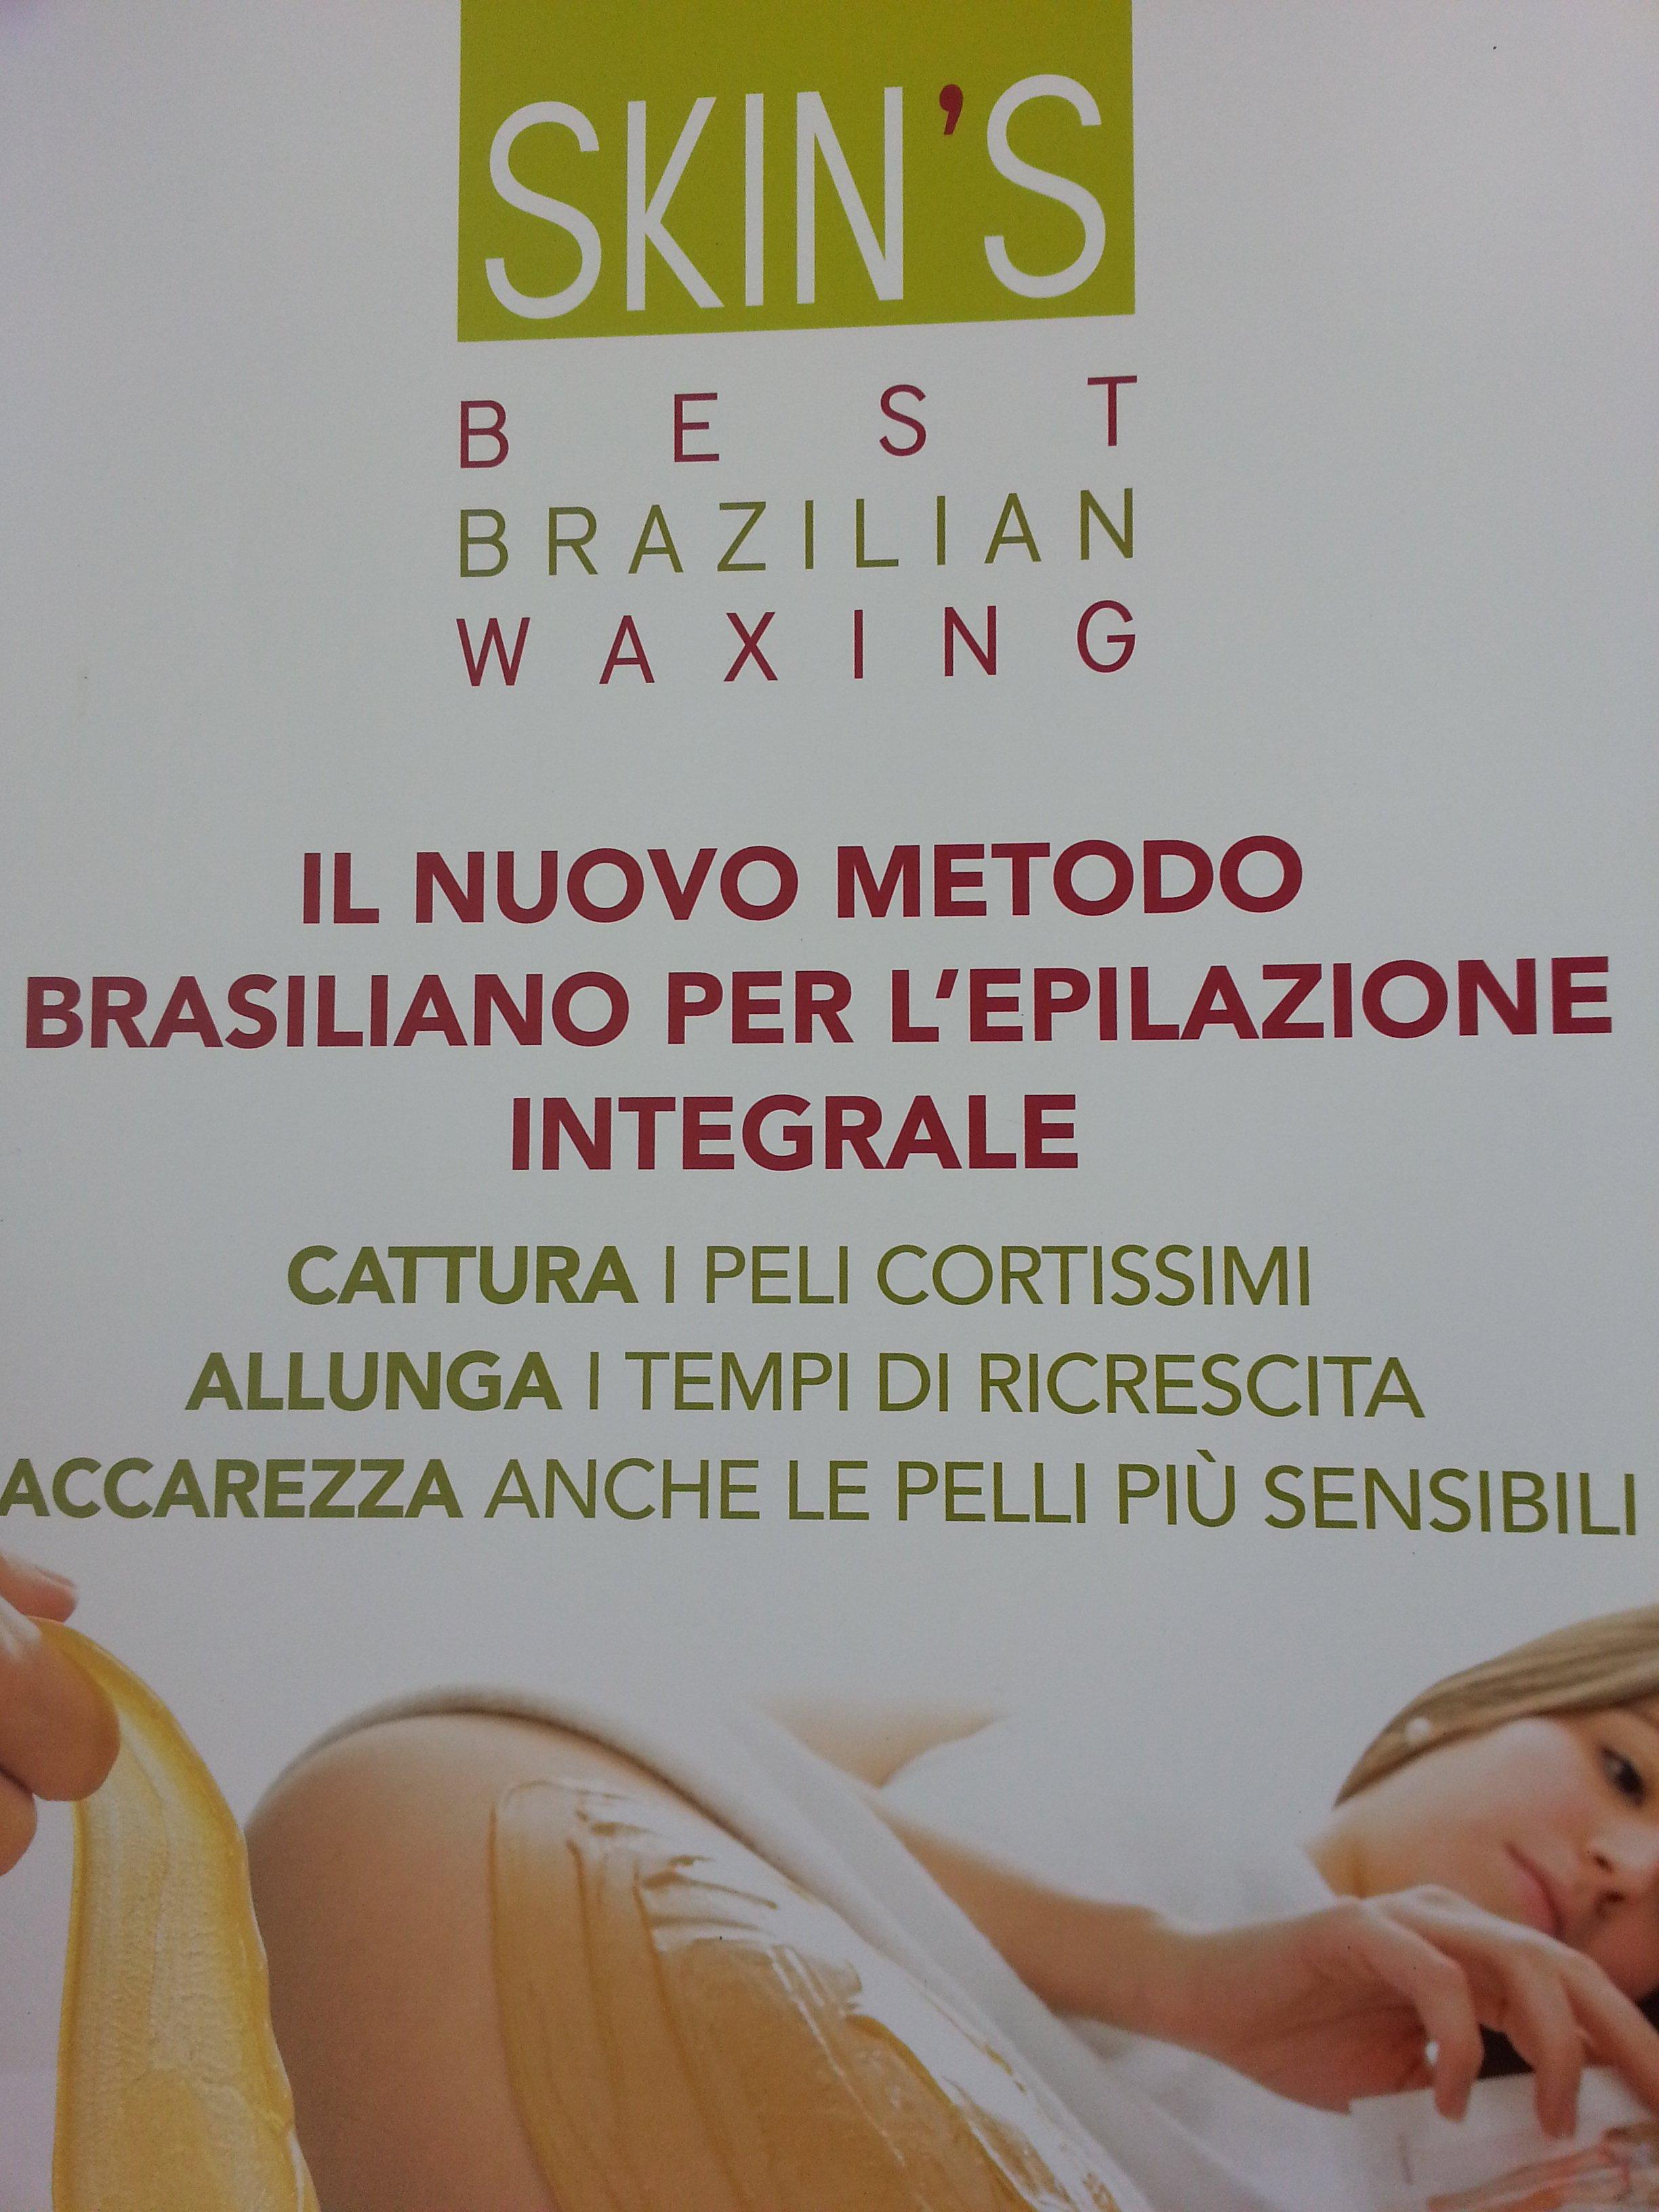 Ceretta brasiliana a Rimini